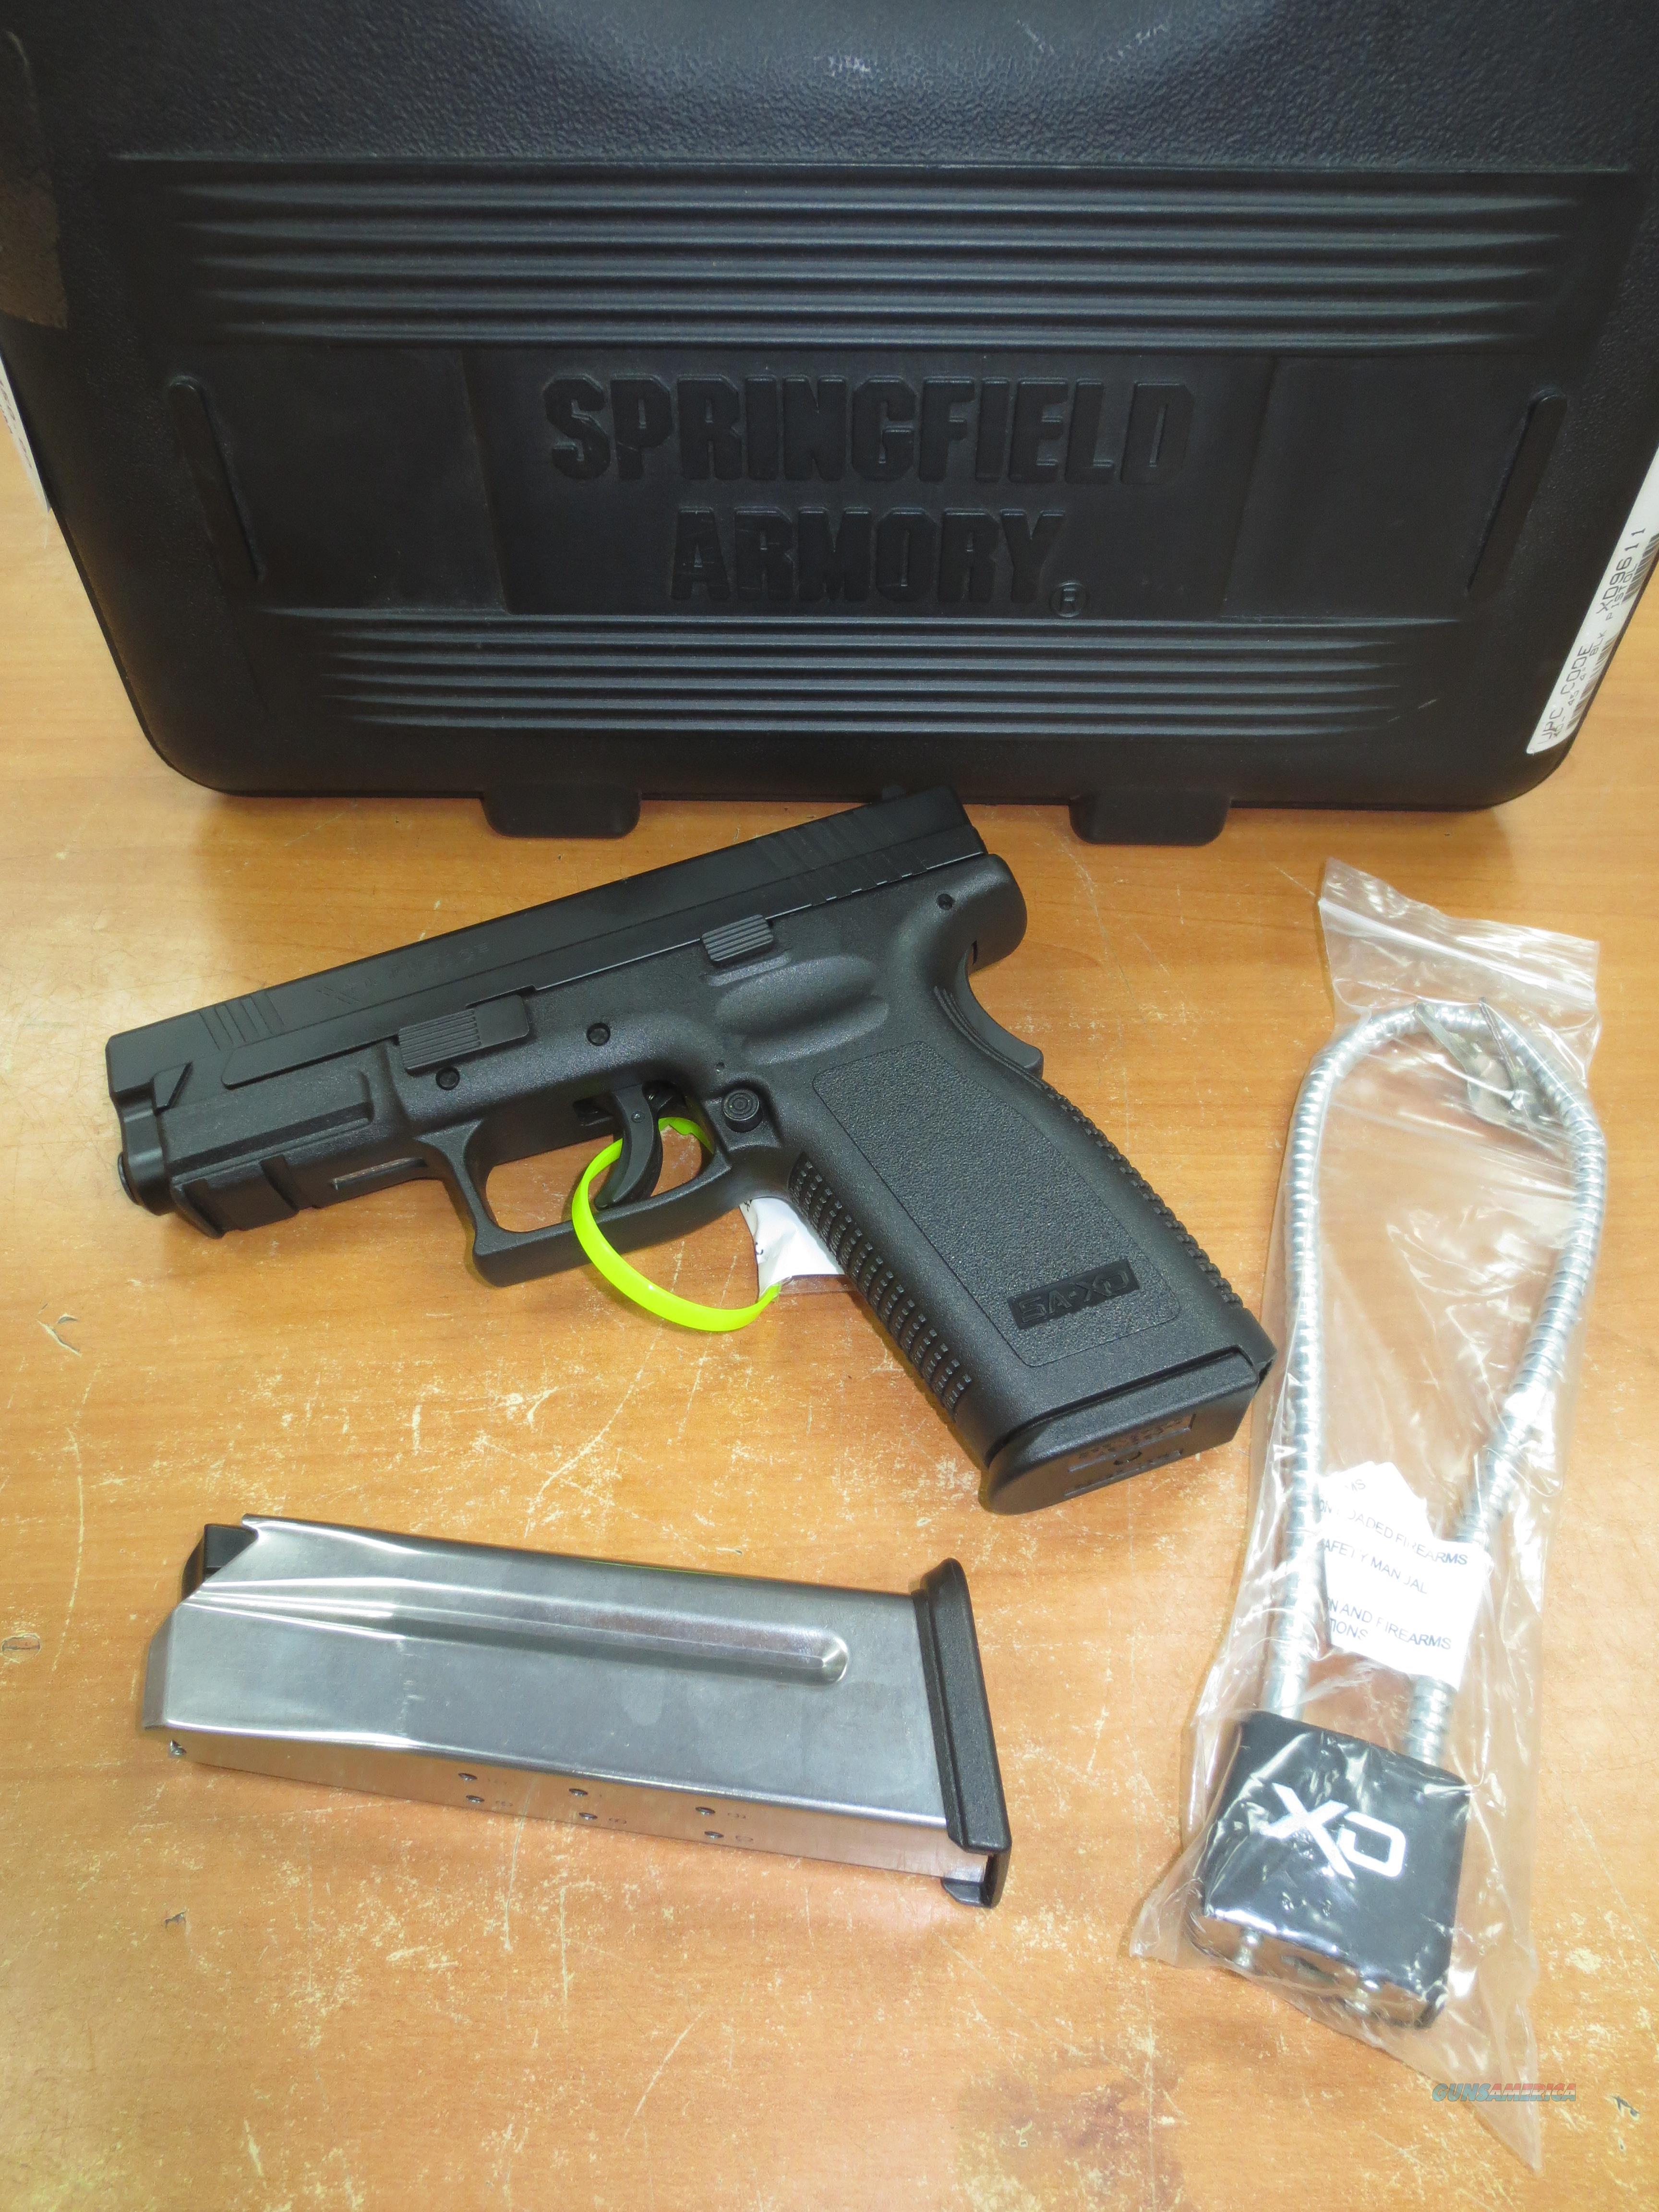 Springfield XD-45 Full frame in Box! CA Ok!   Guns > Pistols > Springfield Armory Pistols > XD (eXtreme Duty)